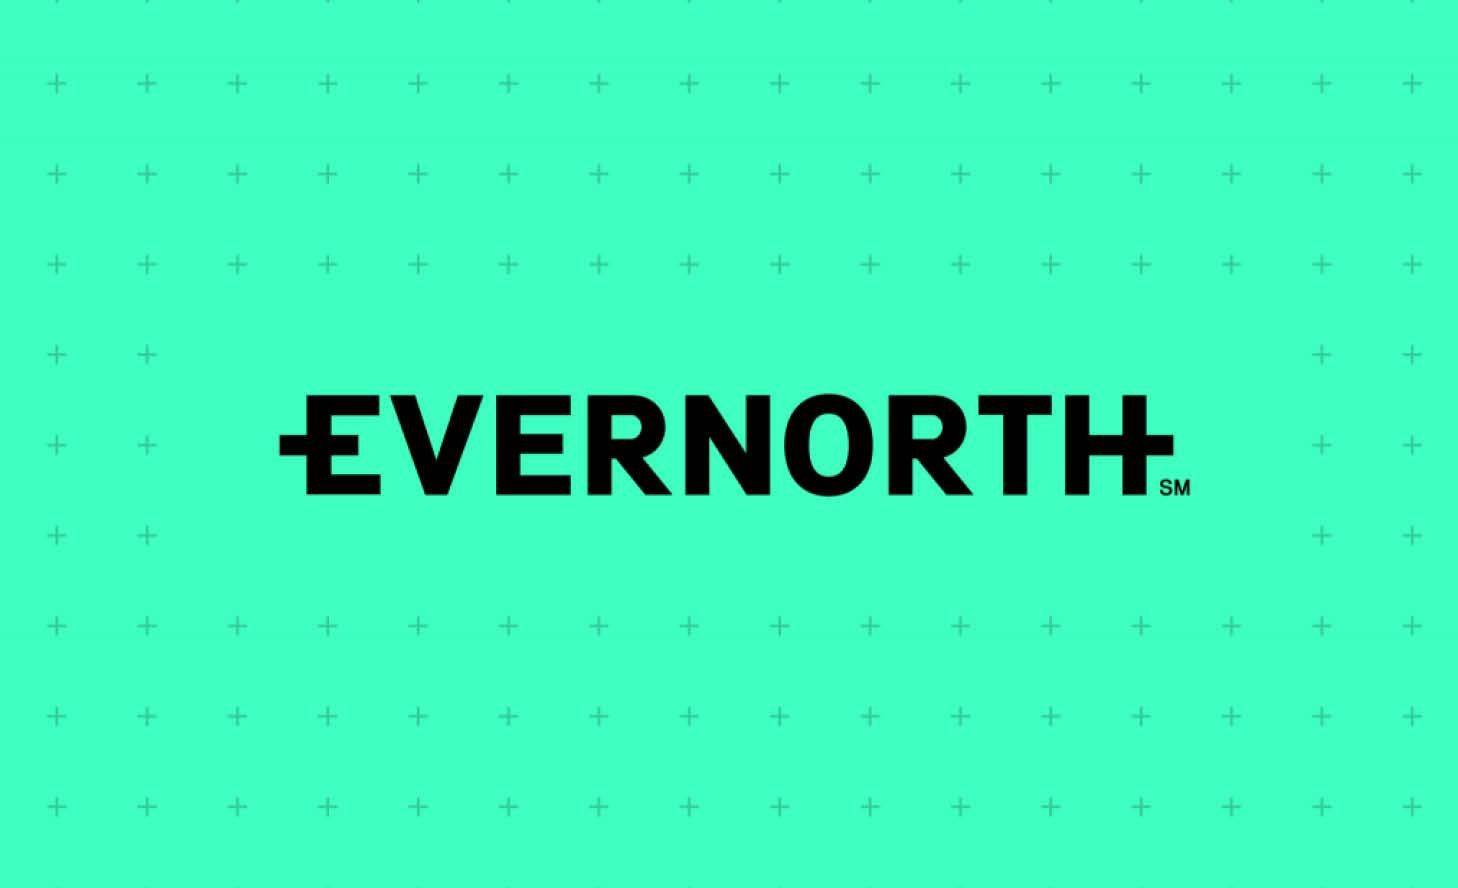 Evernorth_350x213